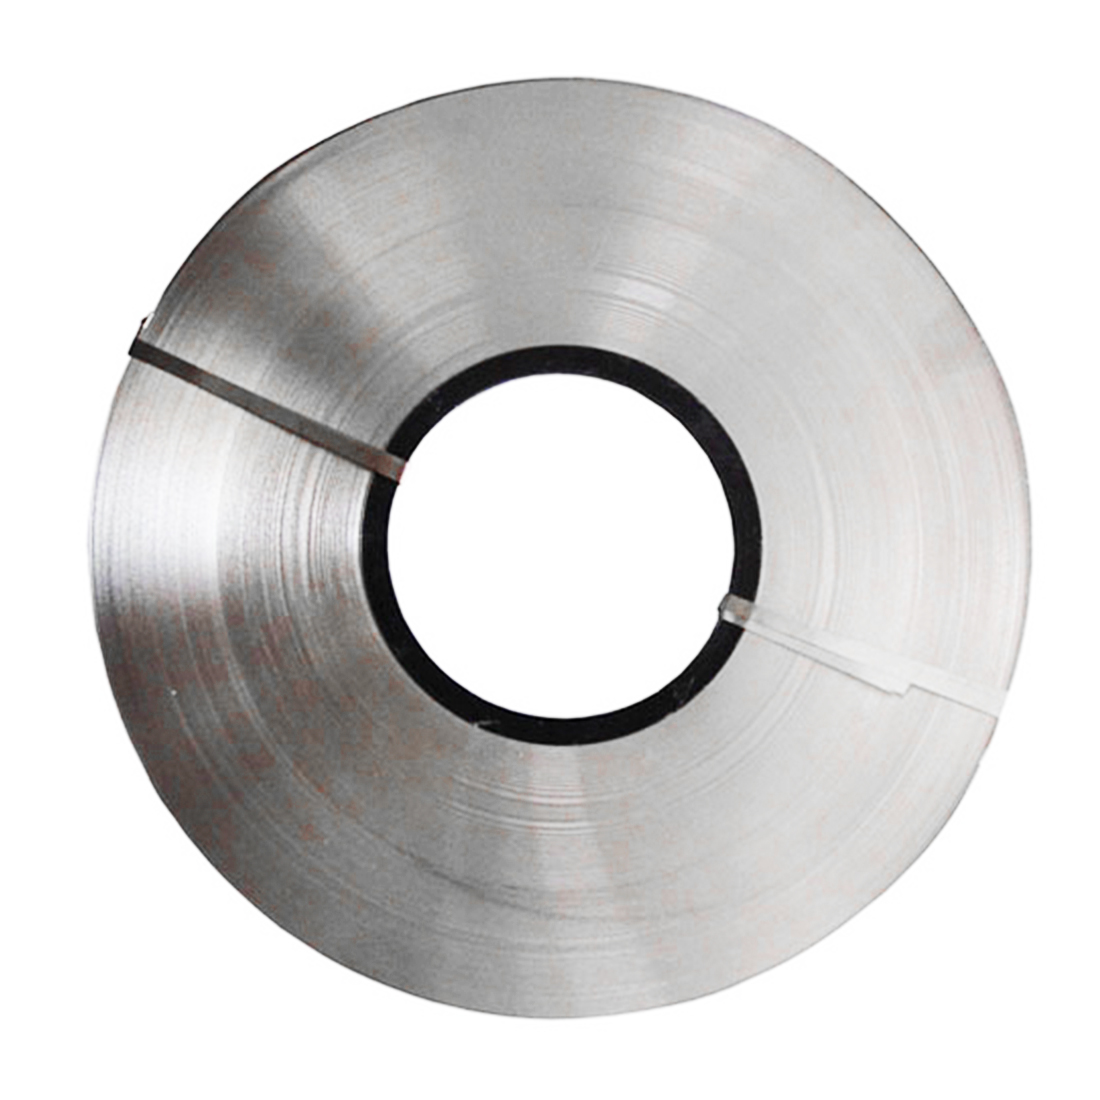 2M Pure Nickel Strip Tape For Li 18650 Battery Spot Welding Compatible For Spot Welder Machine 0.1 X 5mm